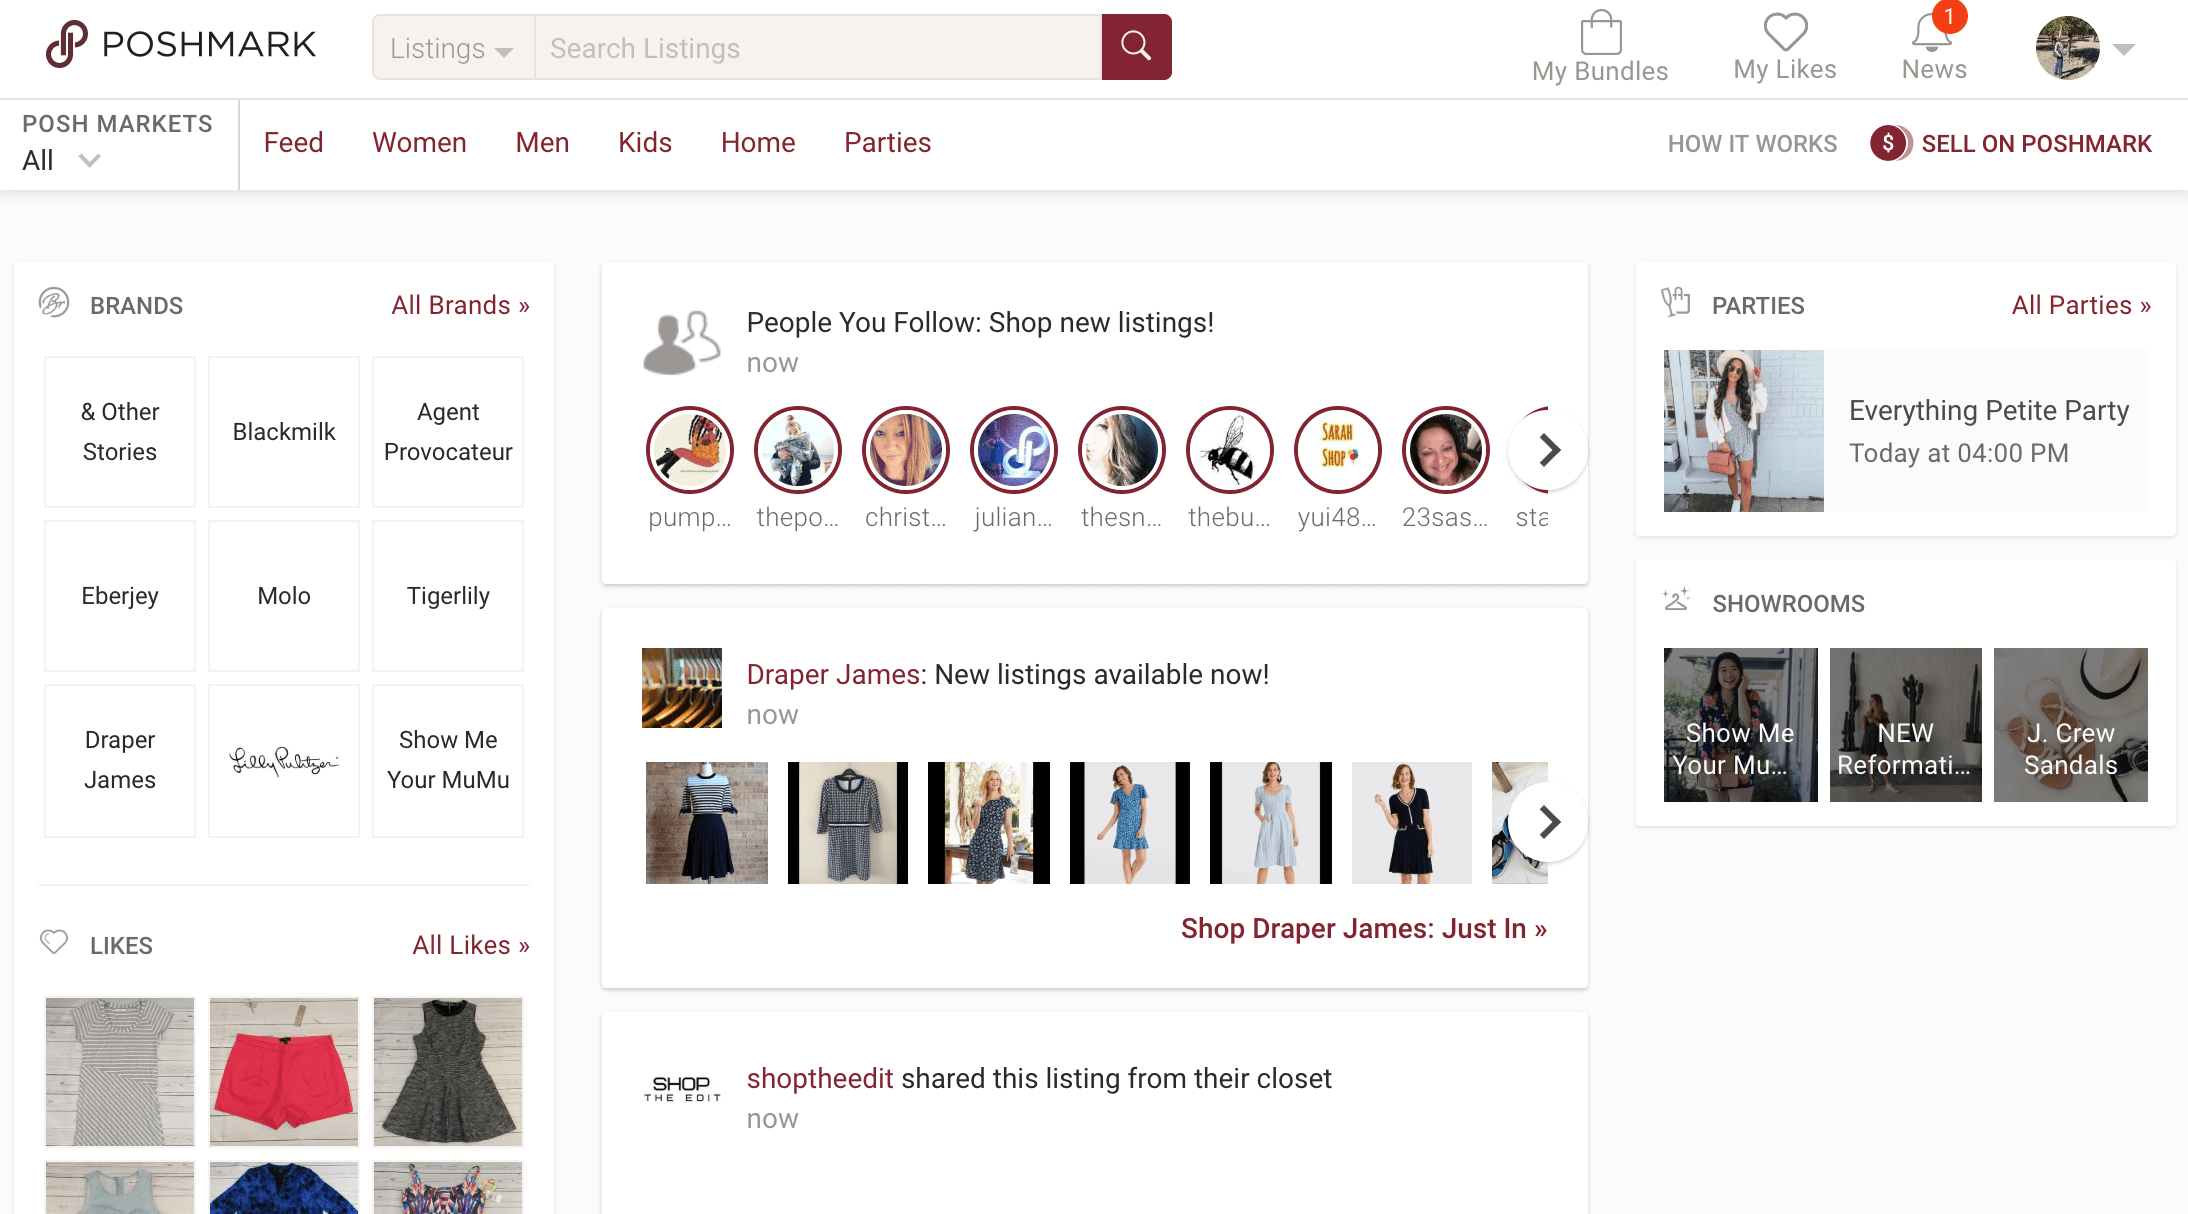 Poshmark homepage & feed